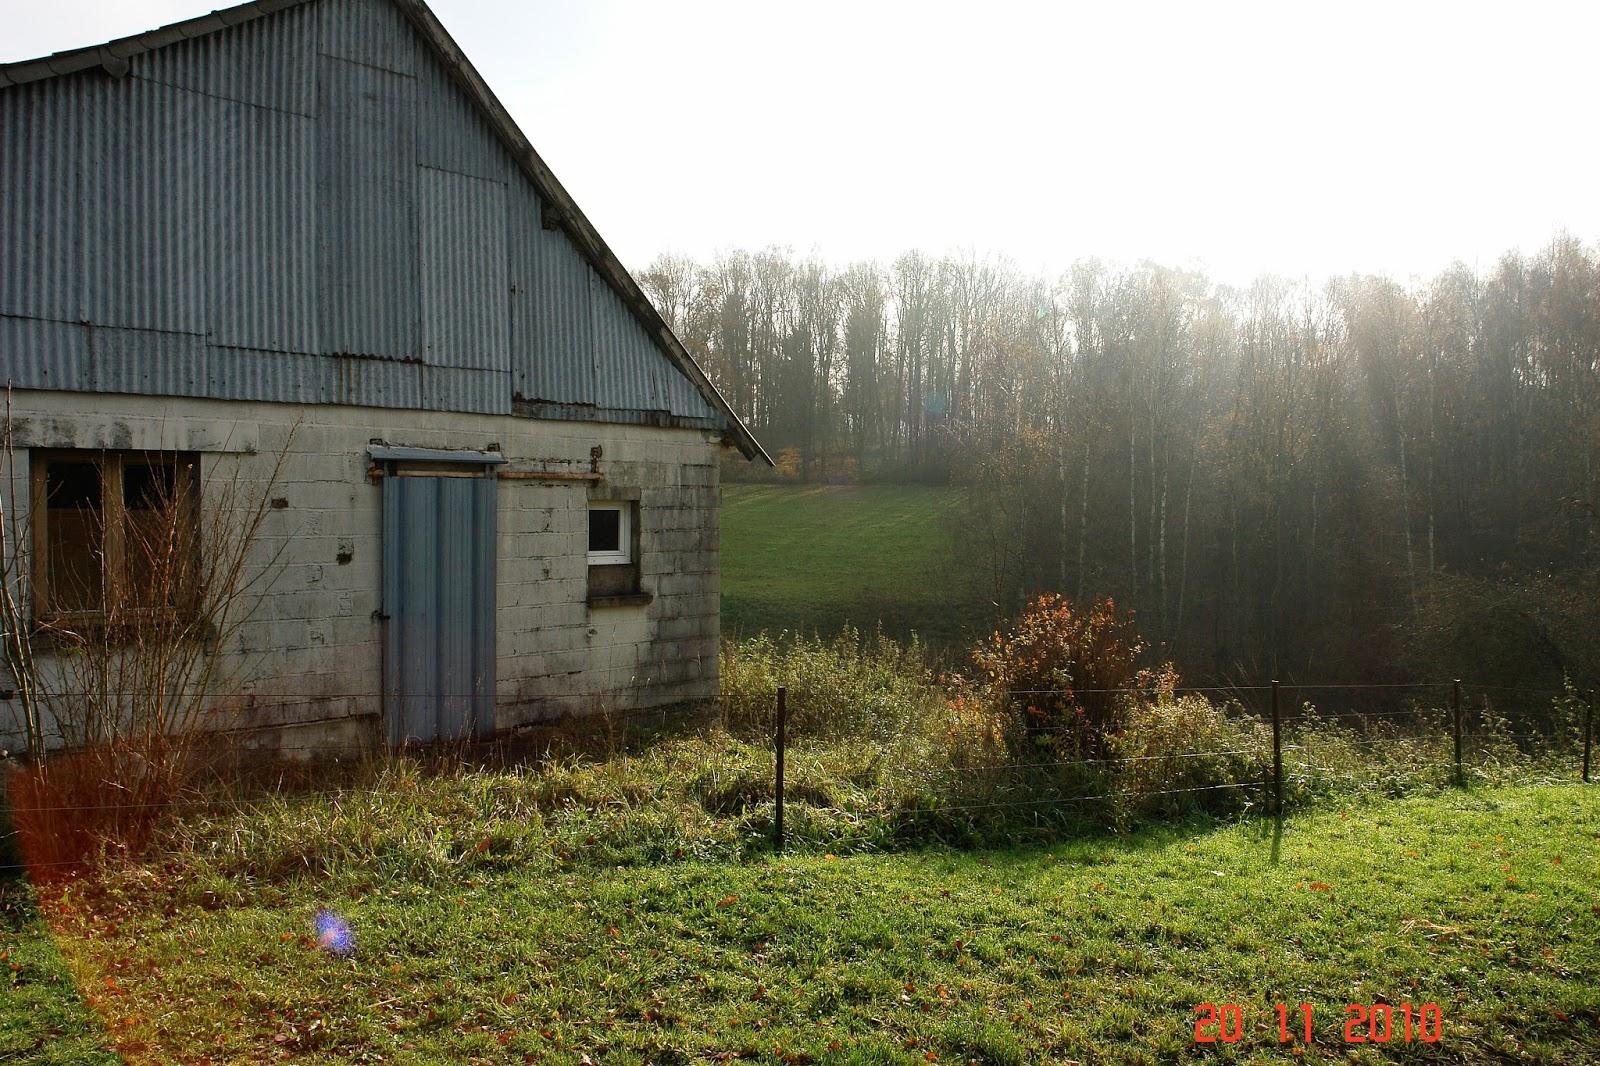 Vakantiehuisje franse ardennen: de verbouwing